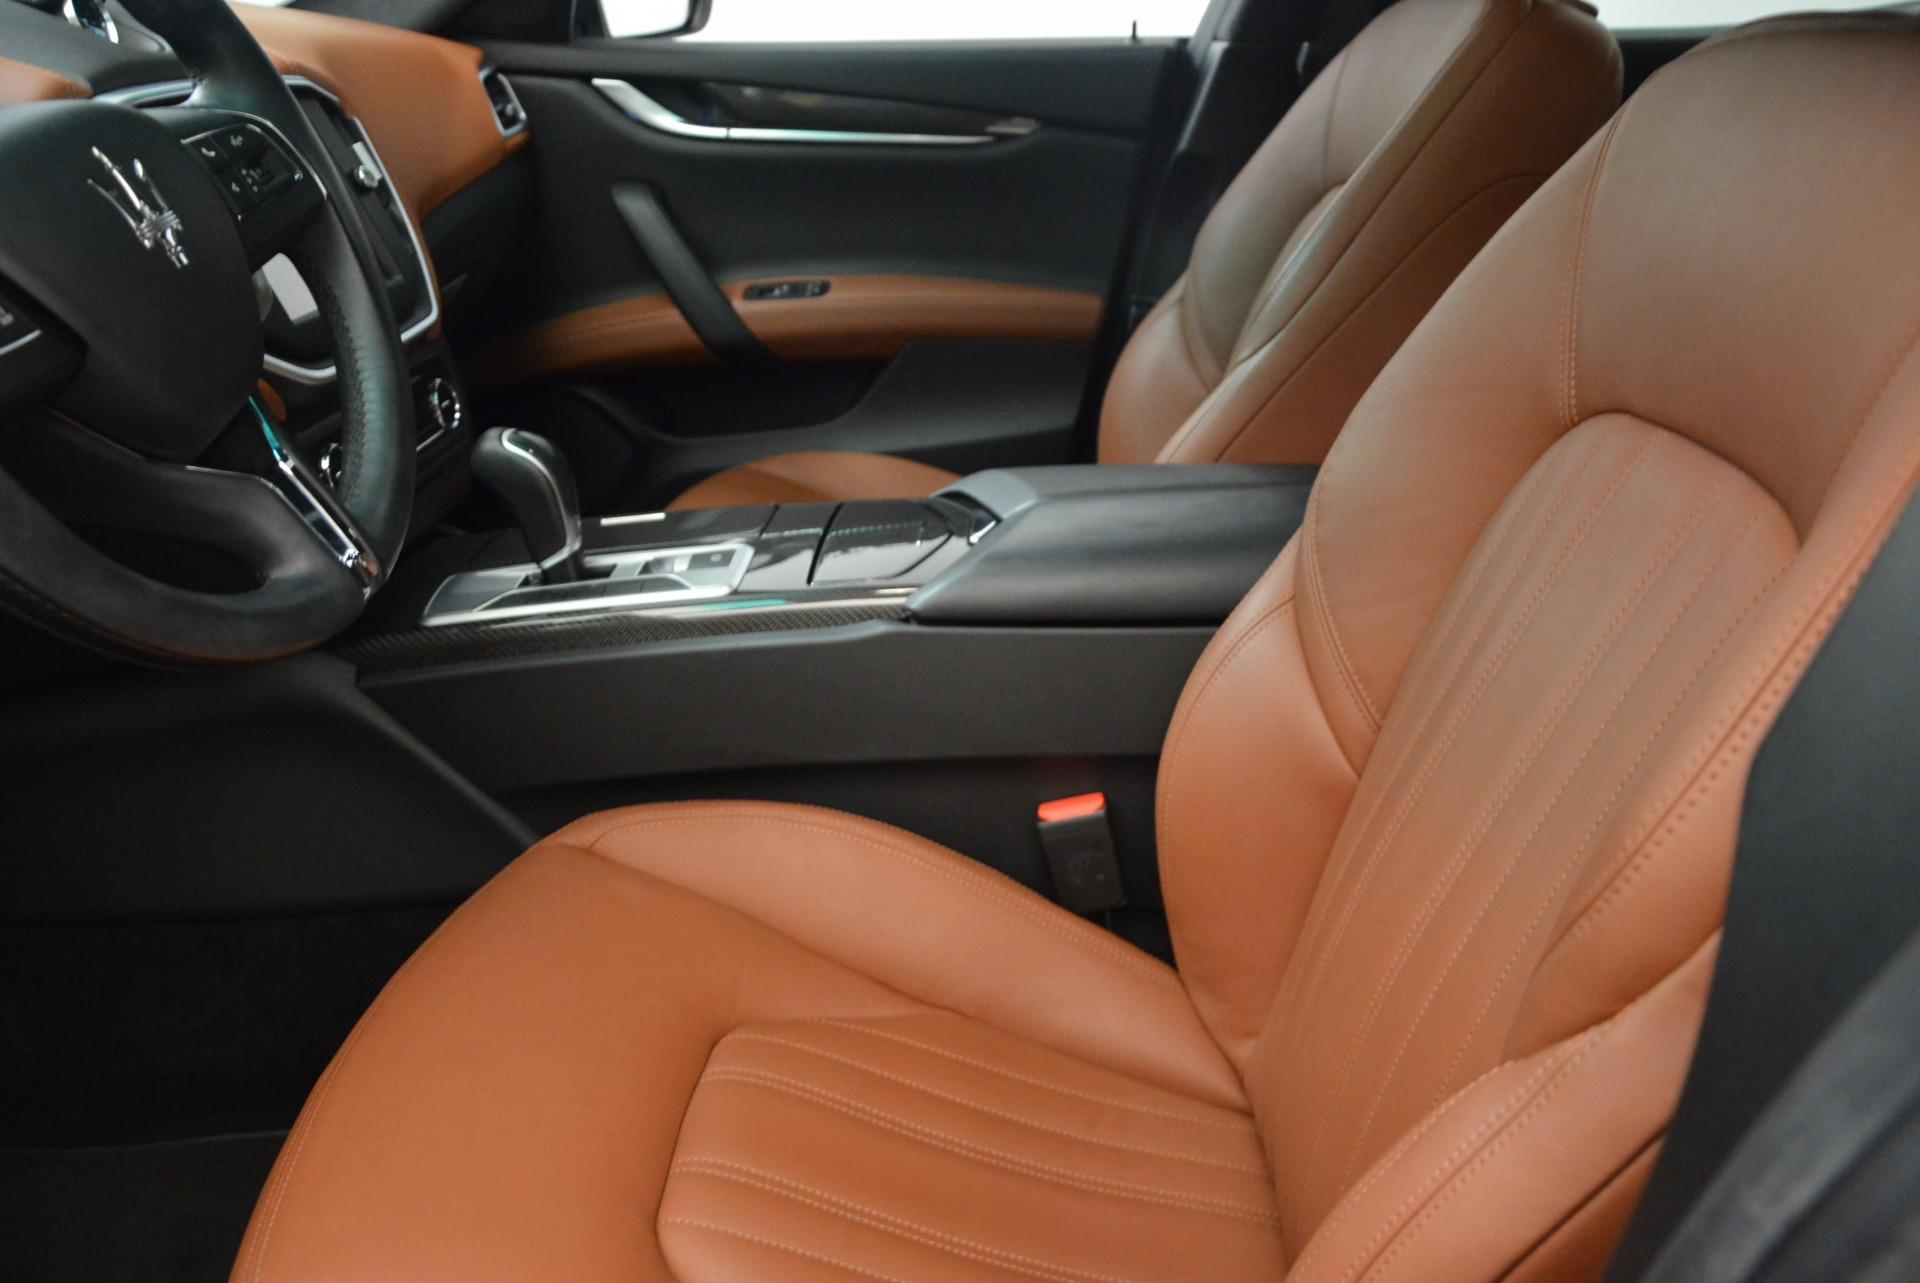 Used 2014 Maserati Ghibli S Q4 For Sale In Greenwich, CT. Alfa Romeo of Greenwich, 7281 1587_p15